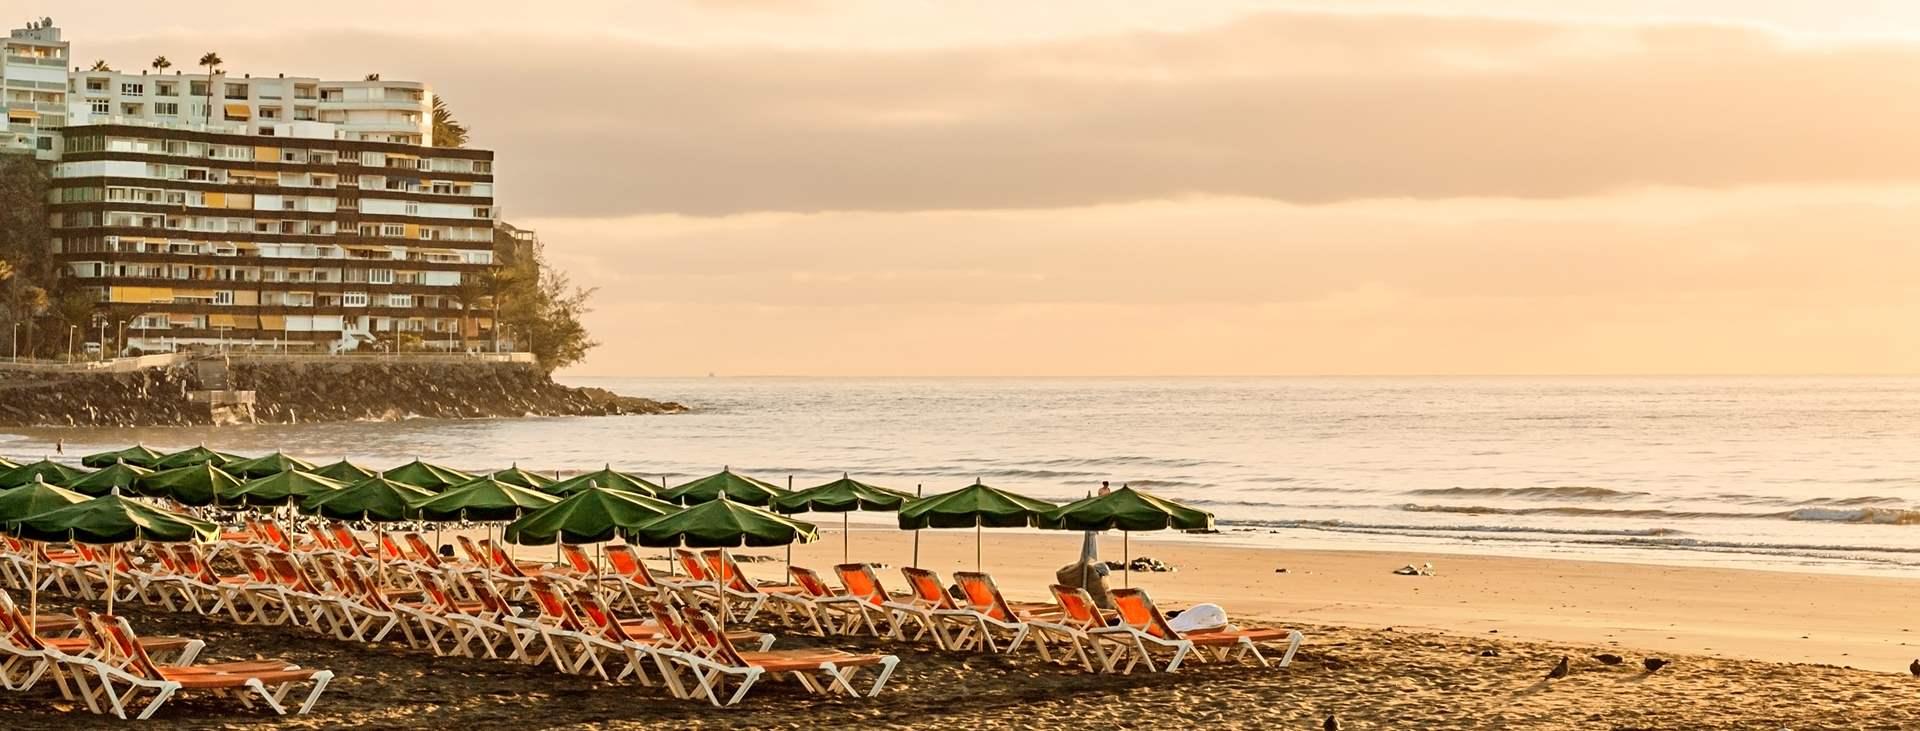 Bestill en reise til San Augustin på Gran Canaria med Ving